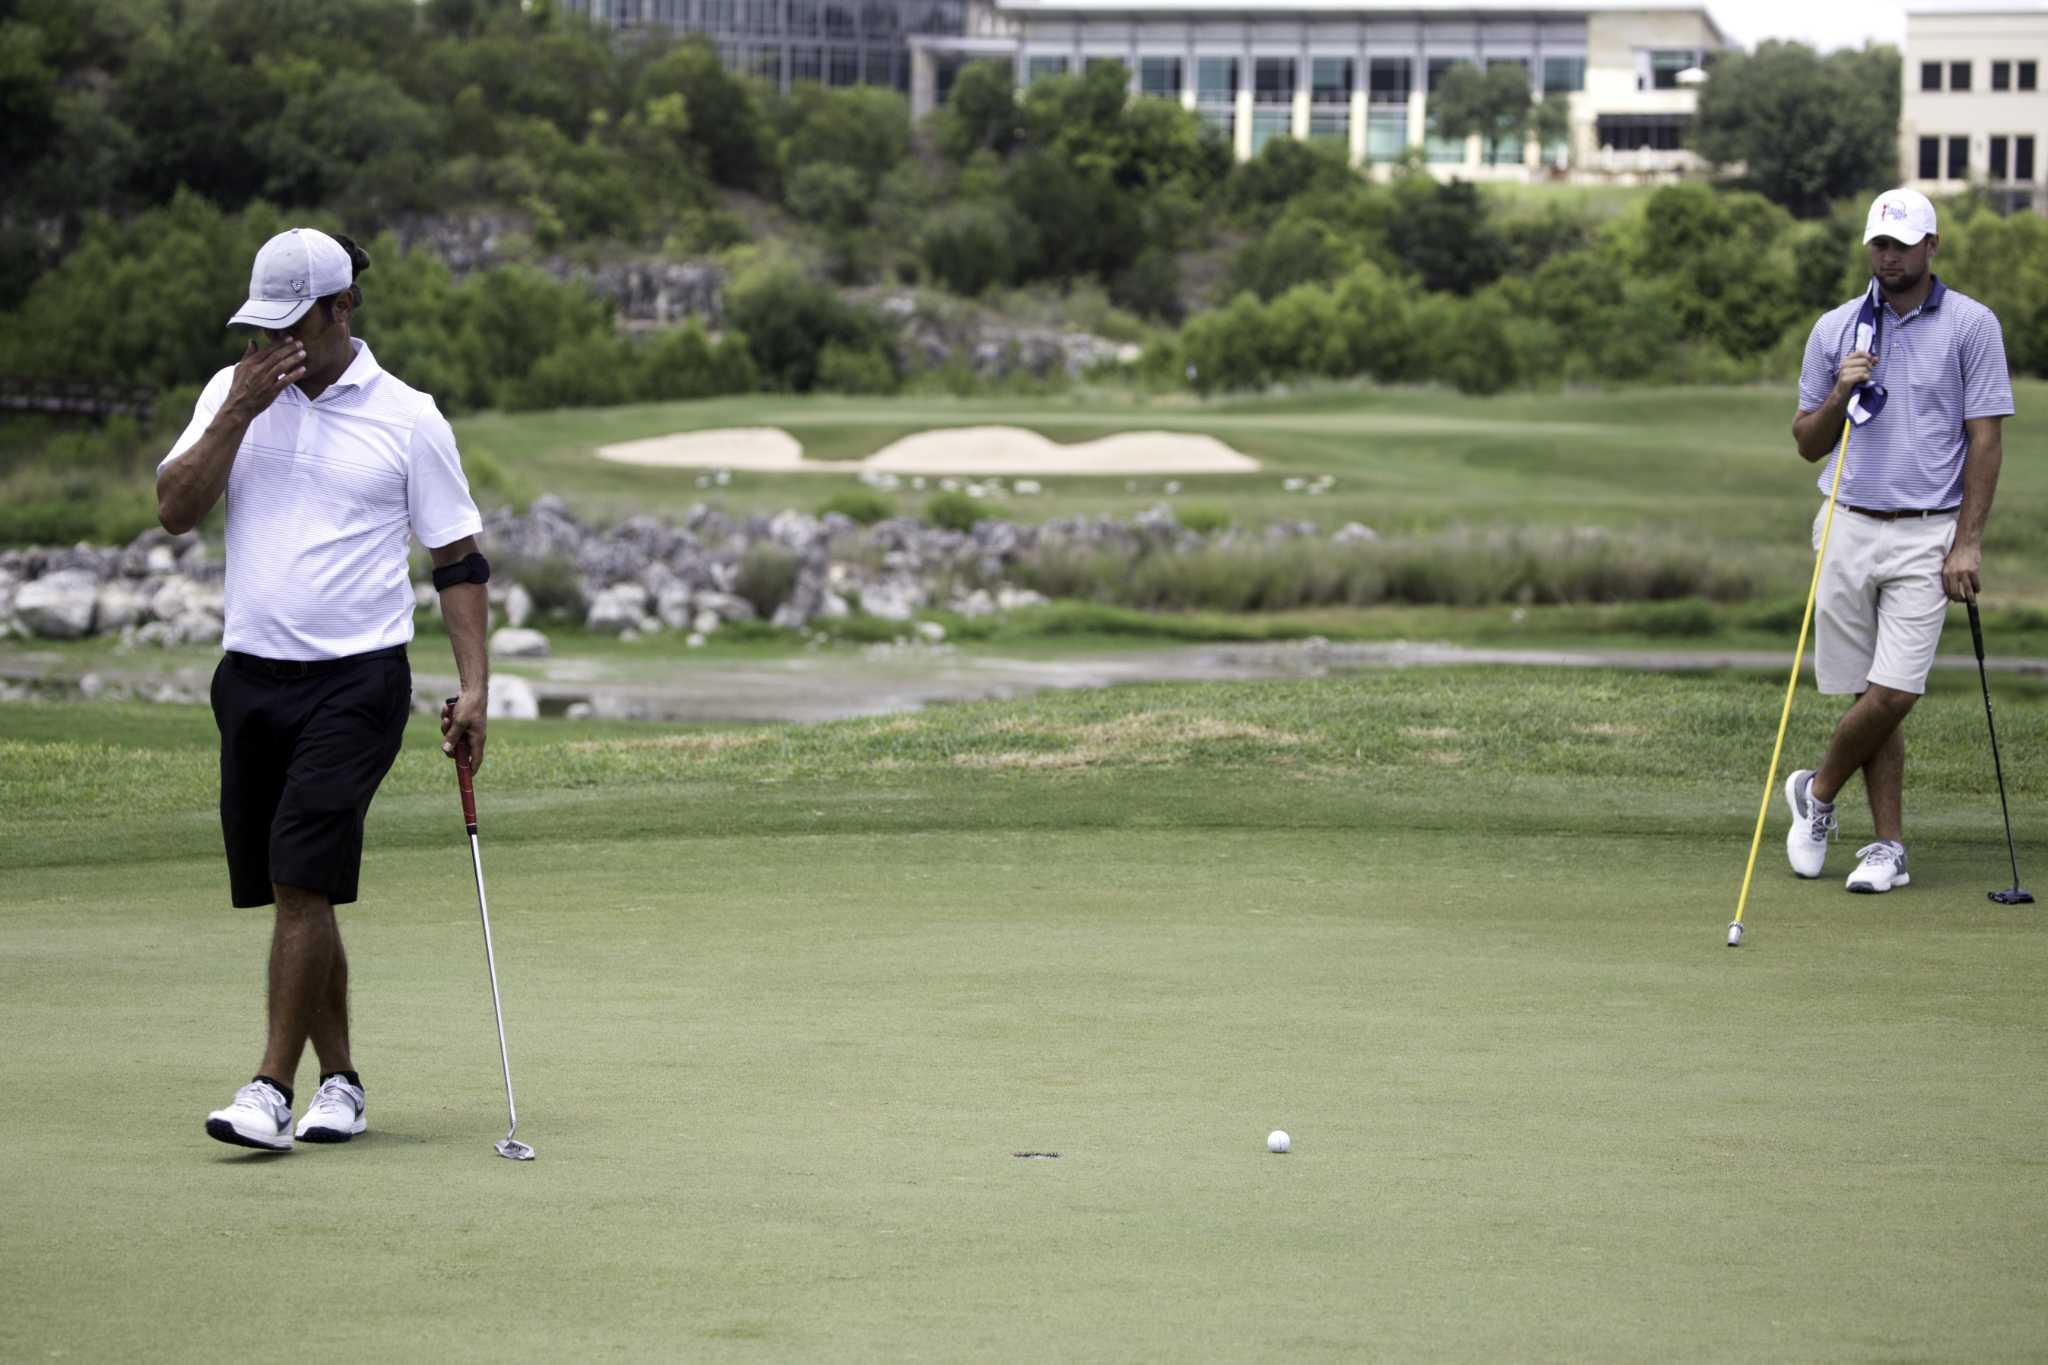 Golf options abound in San Antonio - ExpressNews.com on